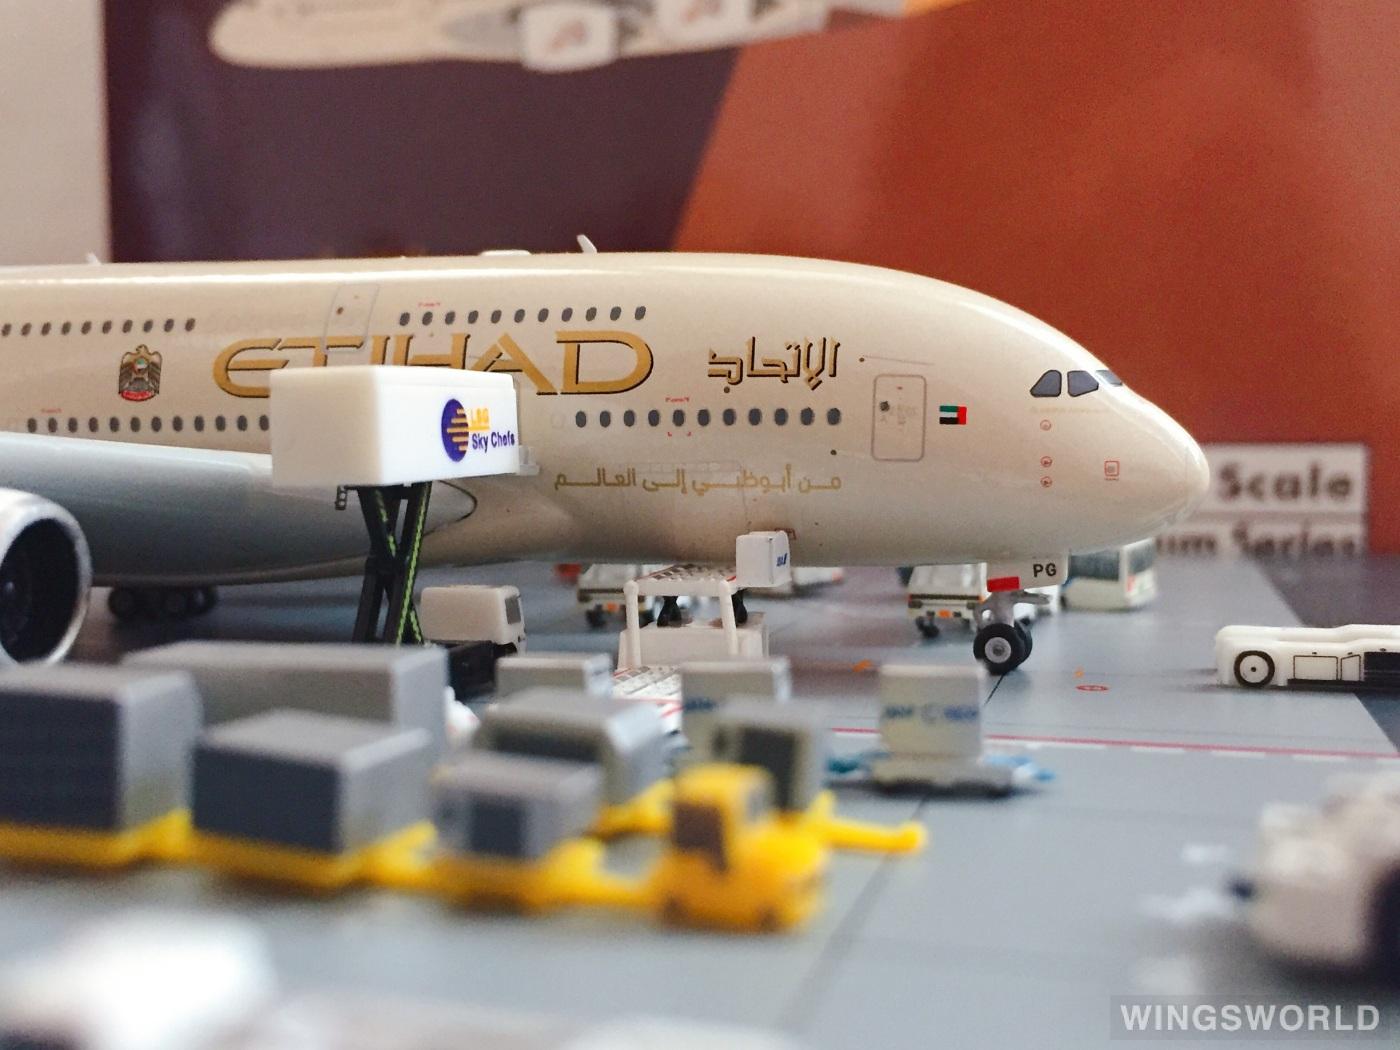 Phoenix 1:400 PH11393 Etihad Airways 阿提哈德航空 Airbus A380-800 A6-APG